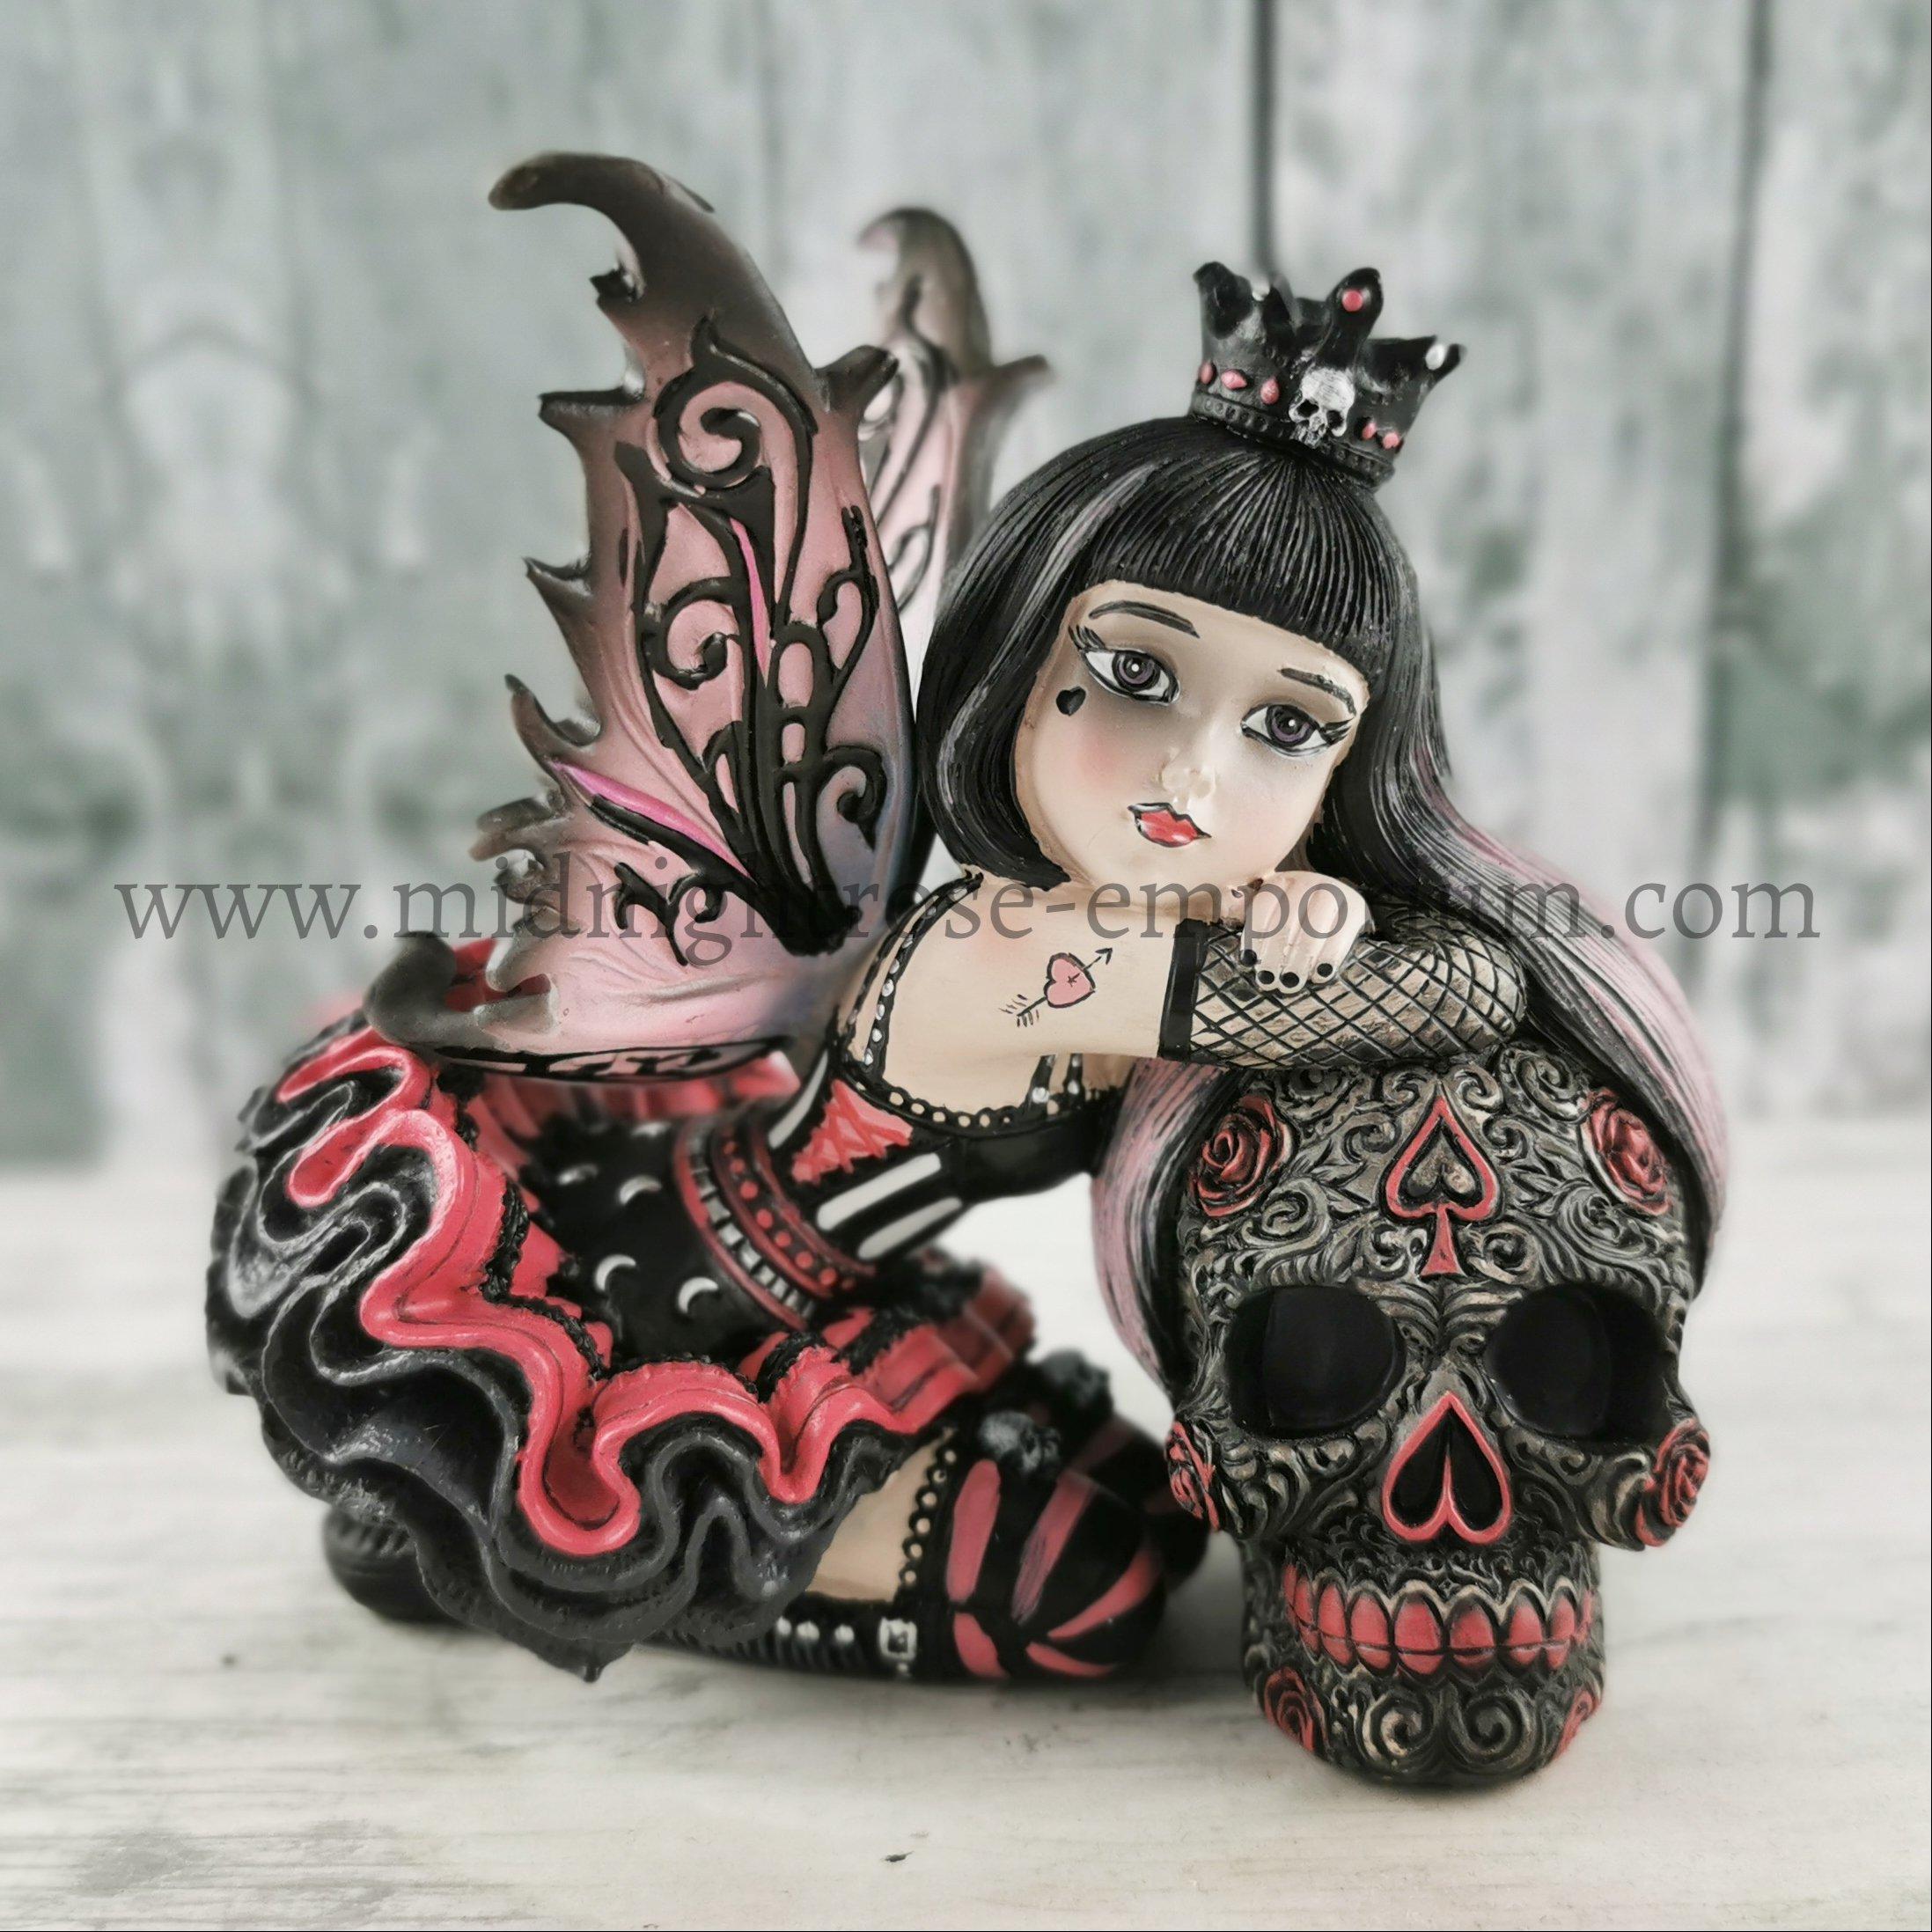 'Lolita' Little Shadows Fairy Figurine 12cm